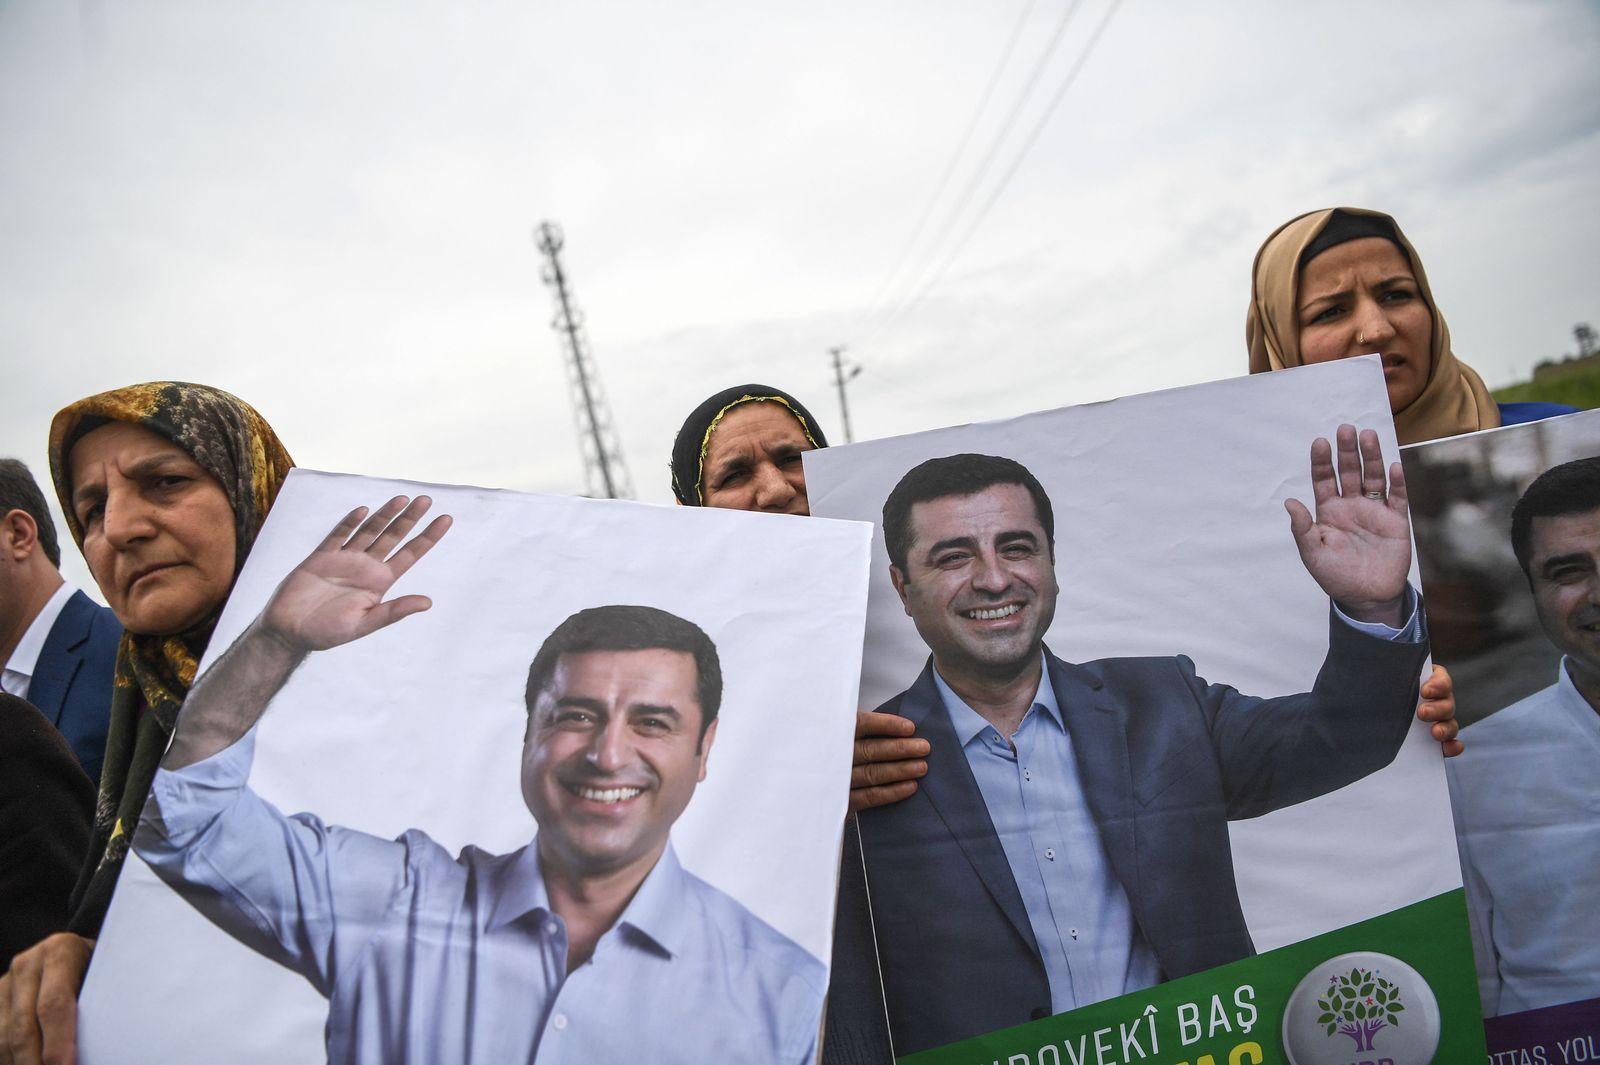 Proteste für Selehattin Demirtas